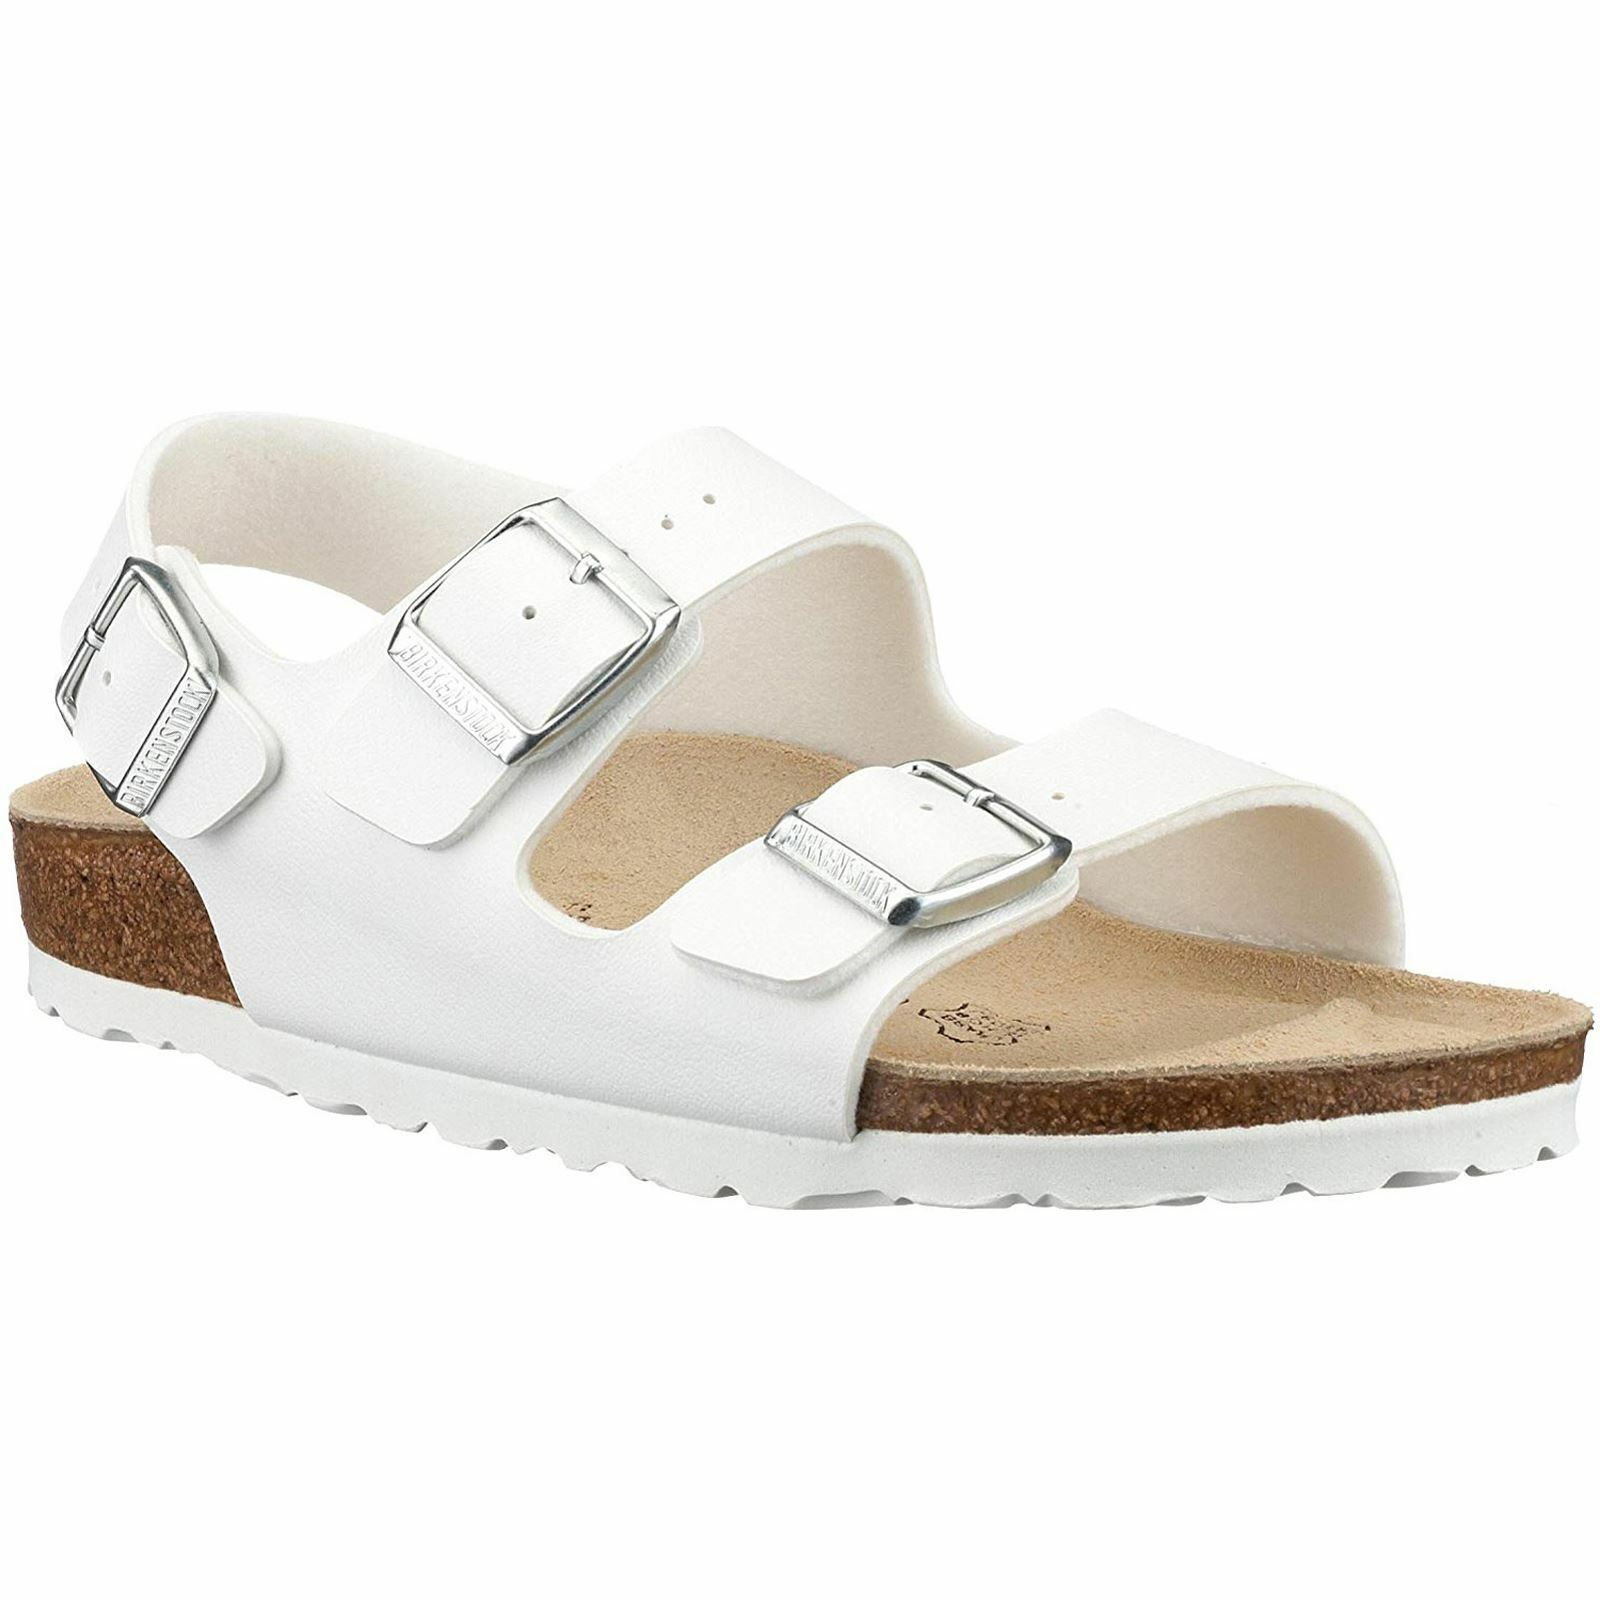 Birkenstock Milano White Mens Birko-Flor Sandals Three Straps Sandals Birko-Flor 85c13f